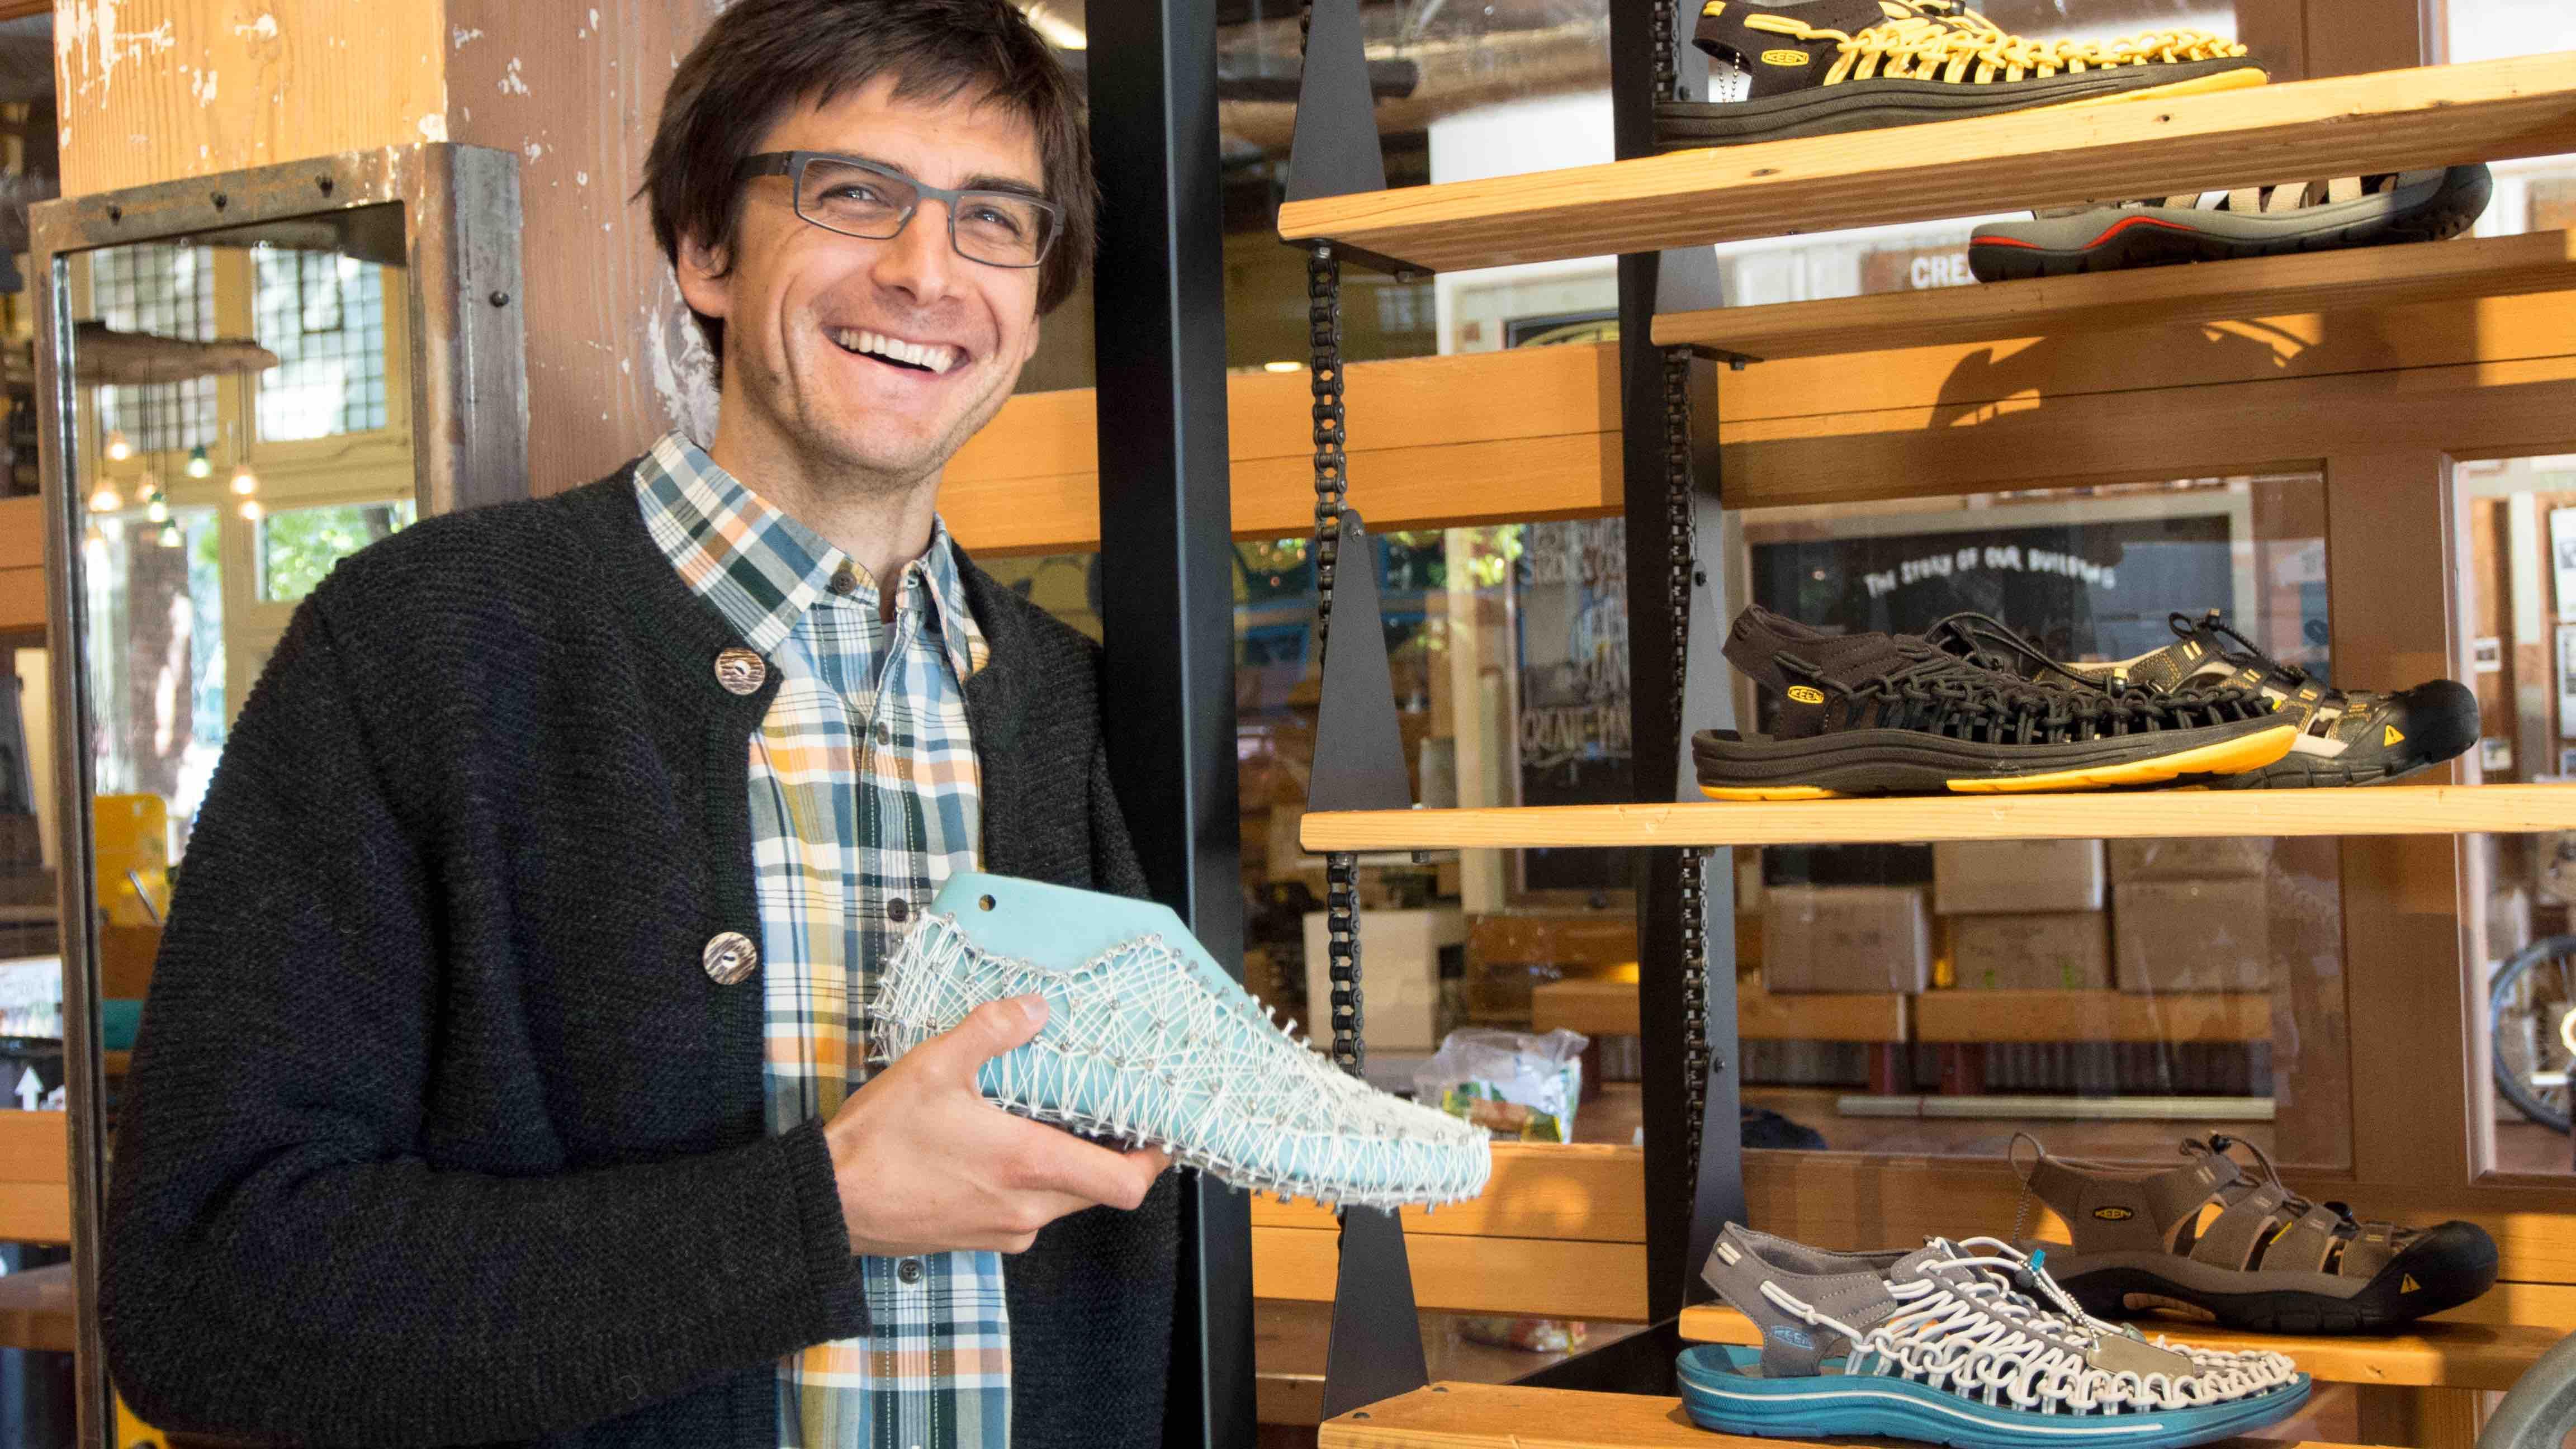 Rory Fuerst, Jr., Director of Innovation, Fuerst Innovation Labs